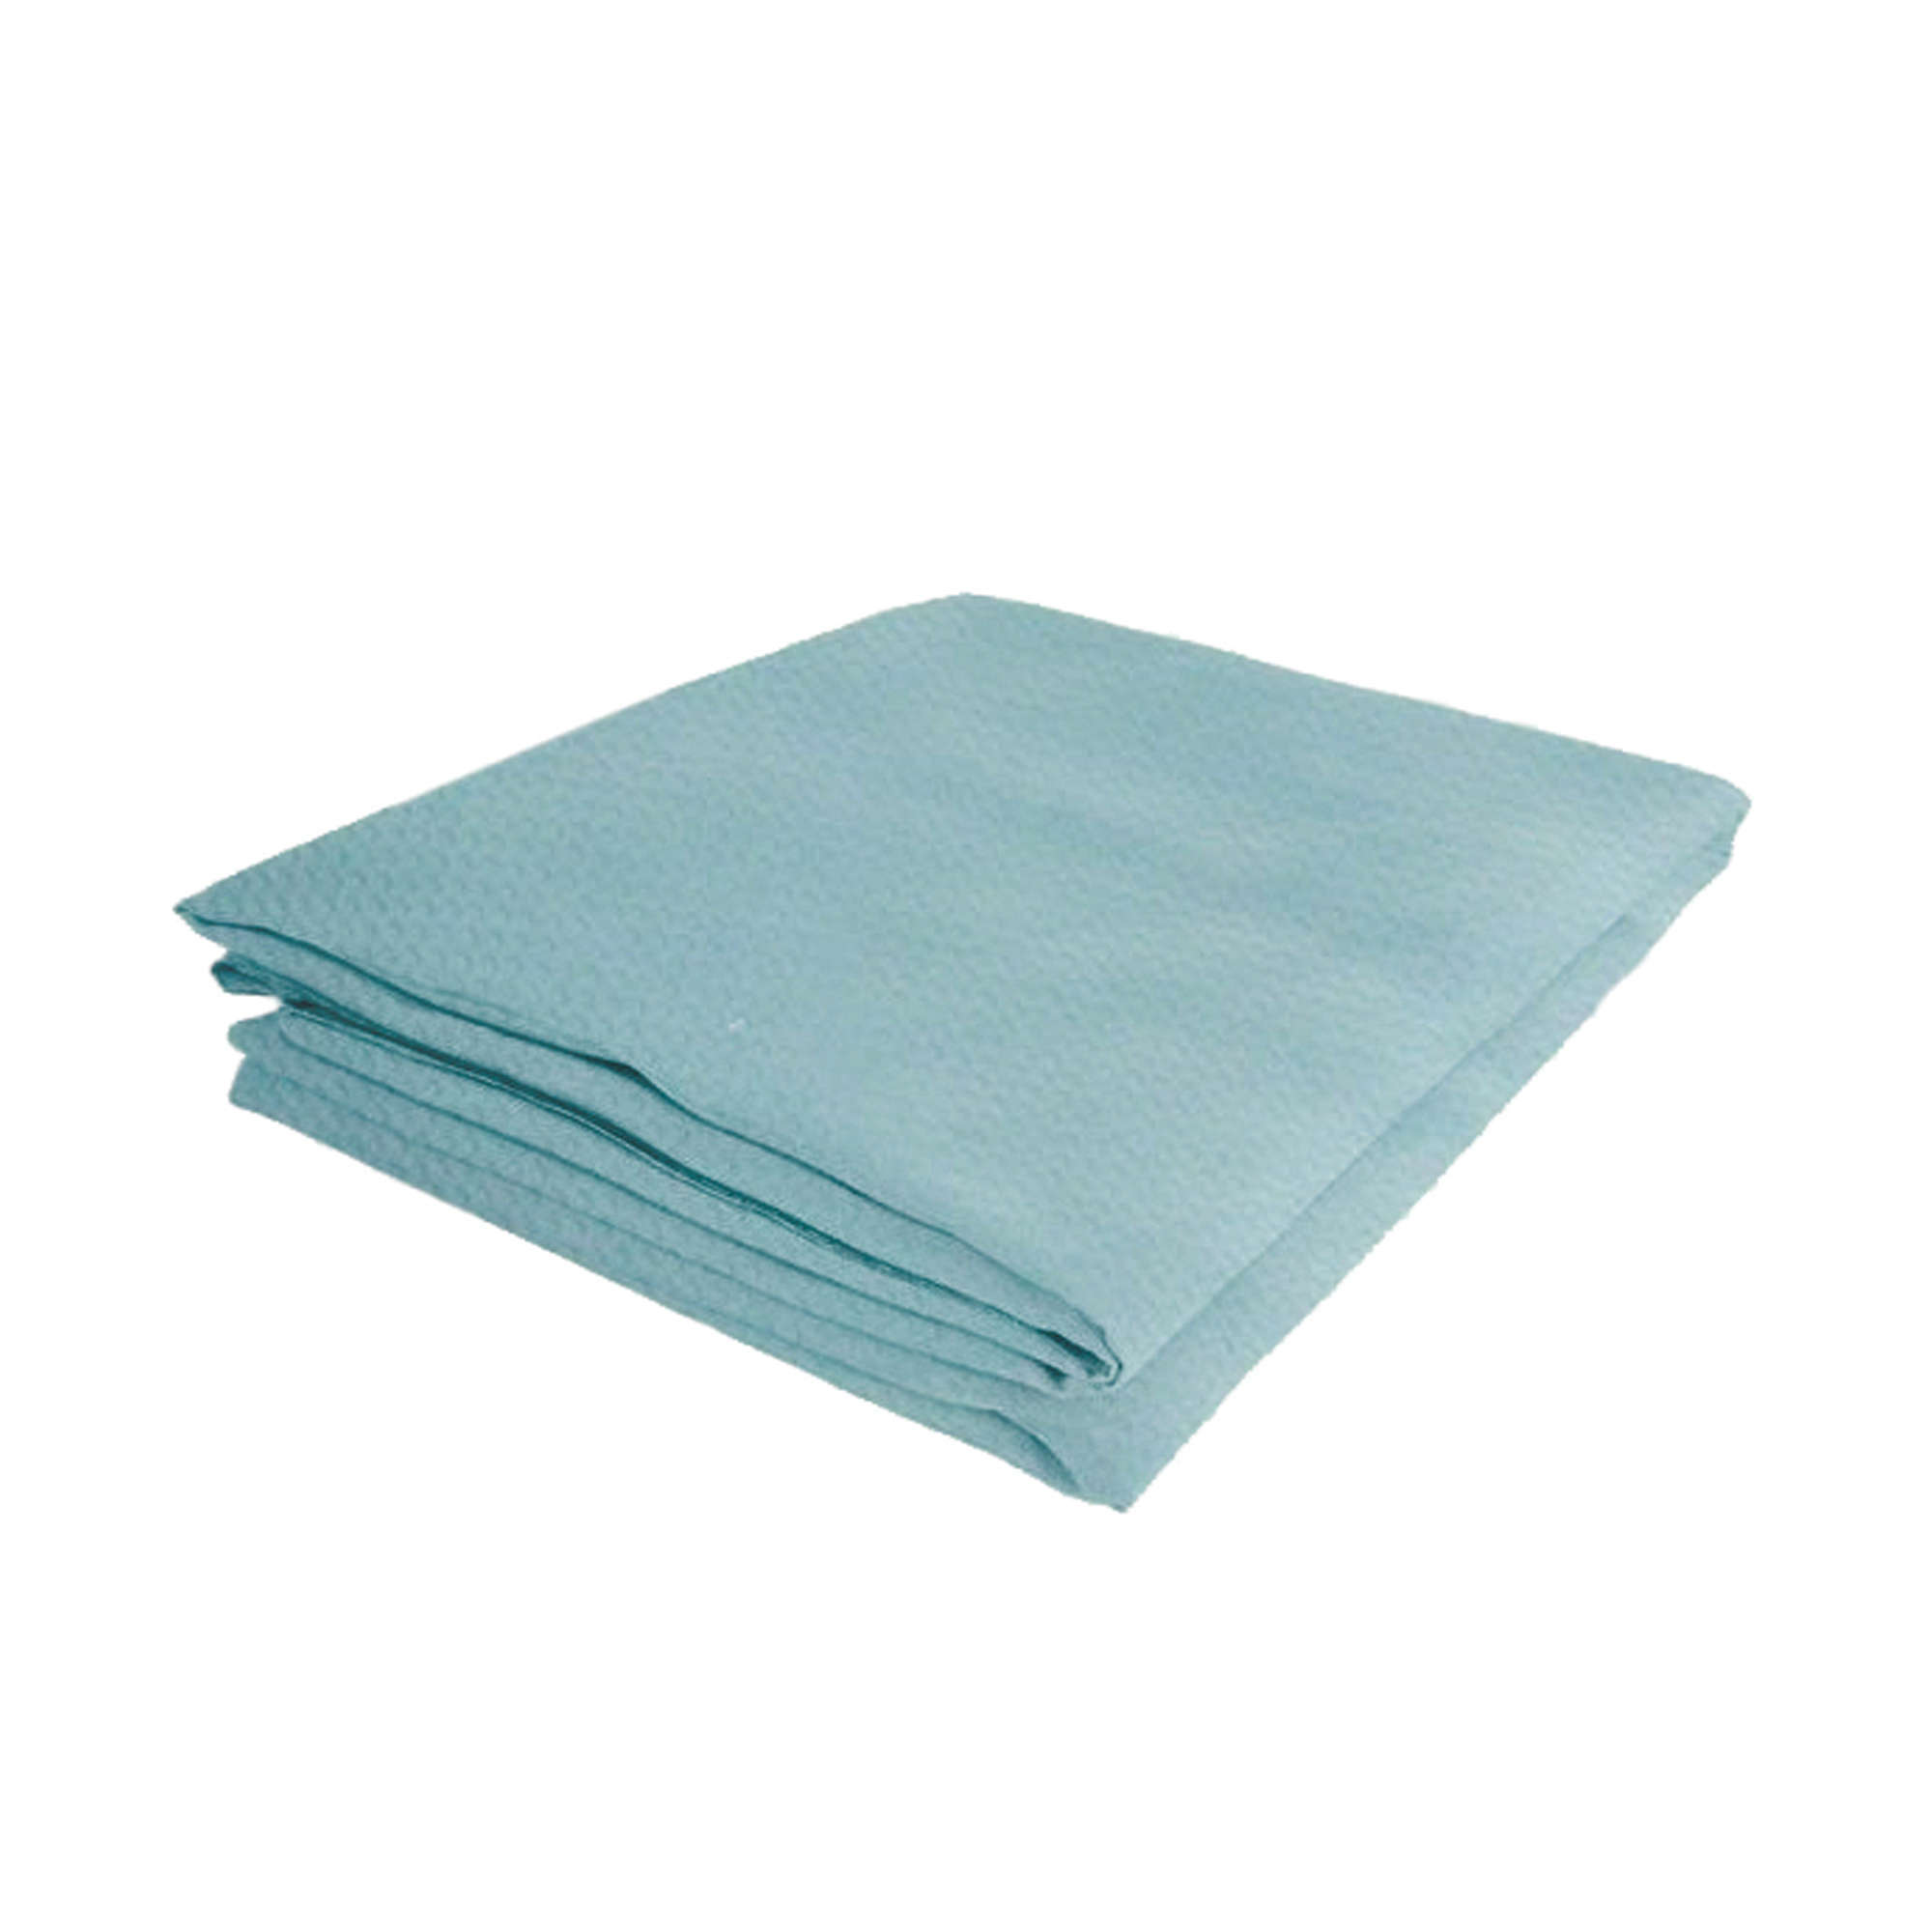 Toldo para cama Montessori 70x140cm verde menta